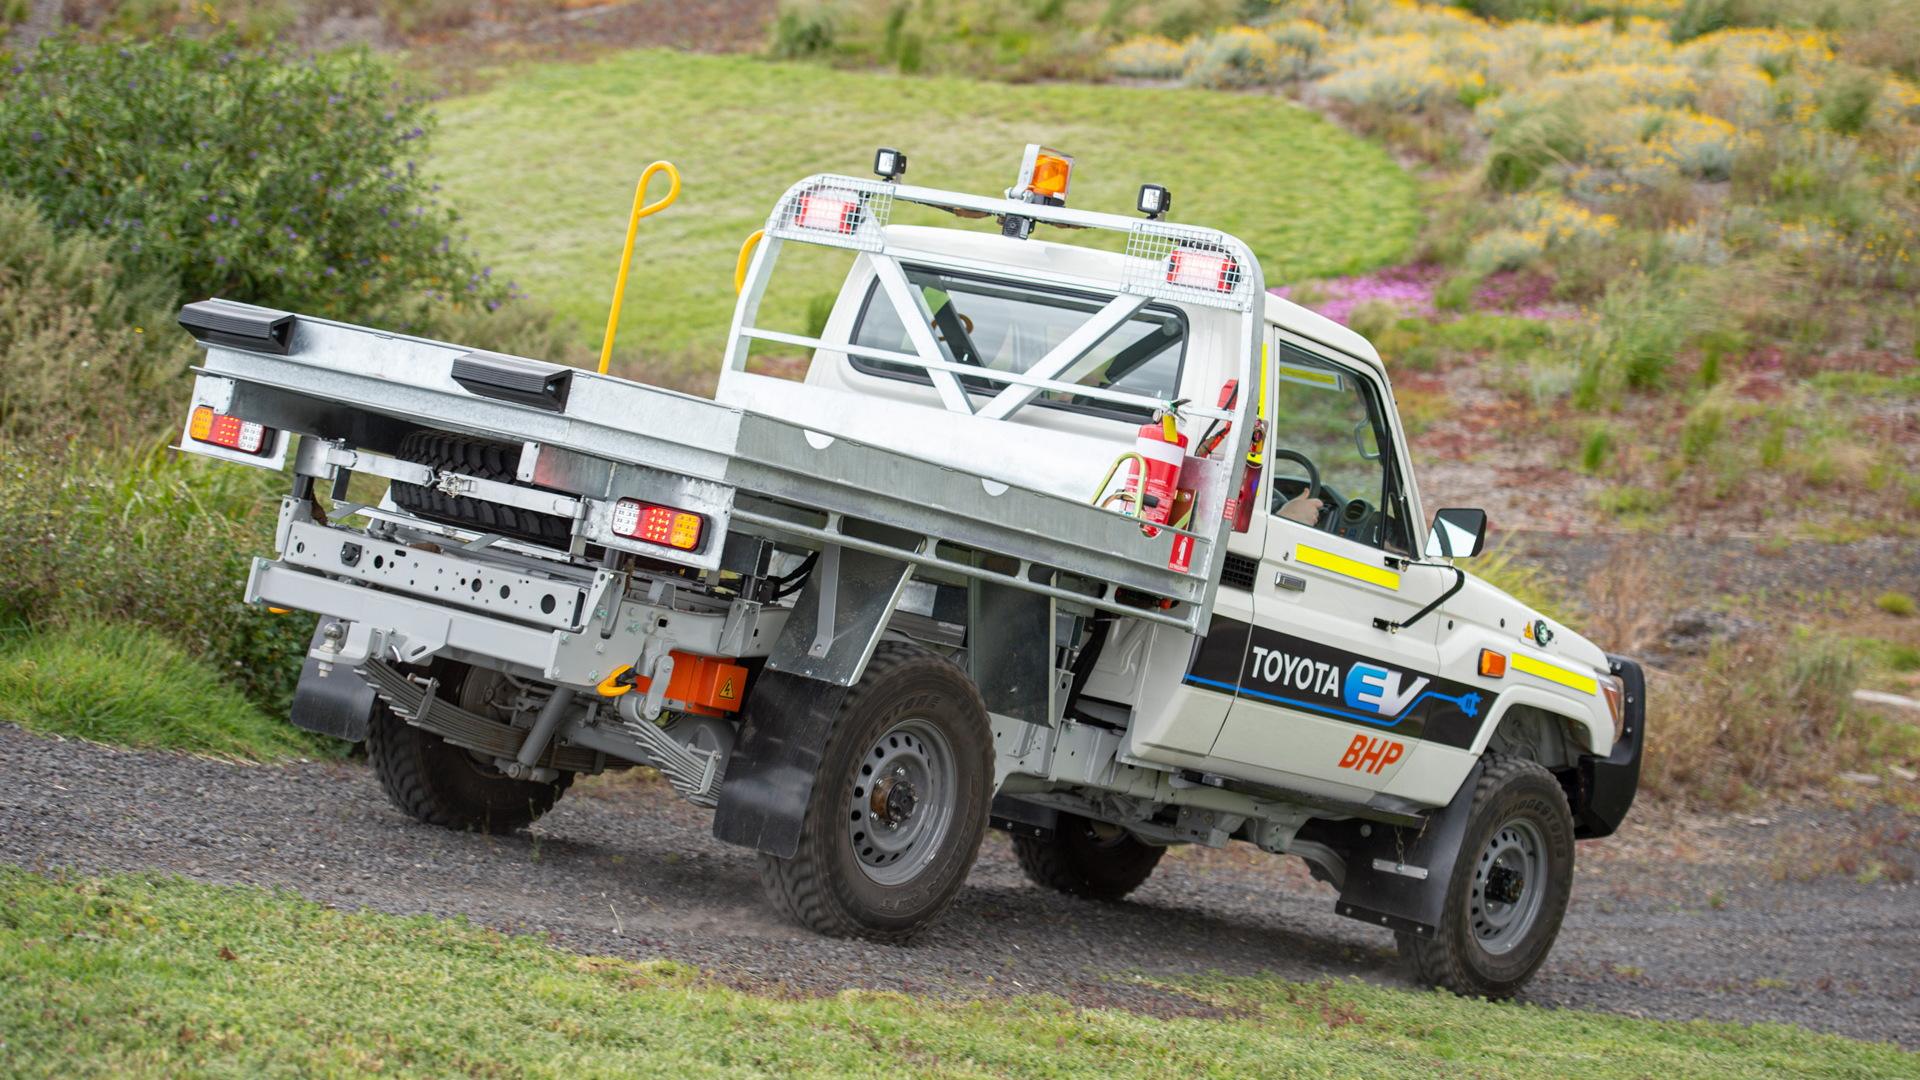 Toyota Land Cruiser 70 battery-electric prototype